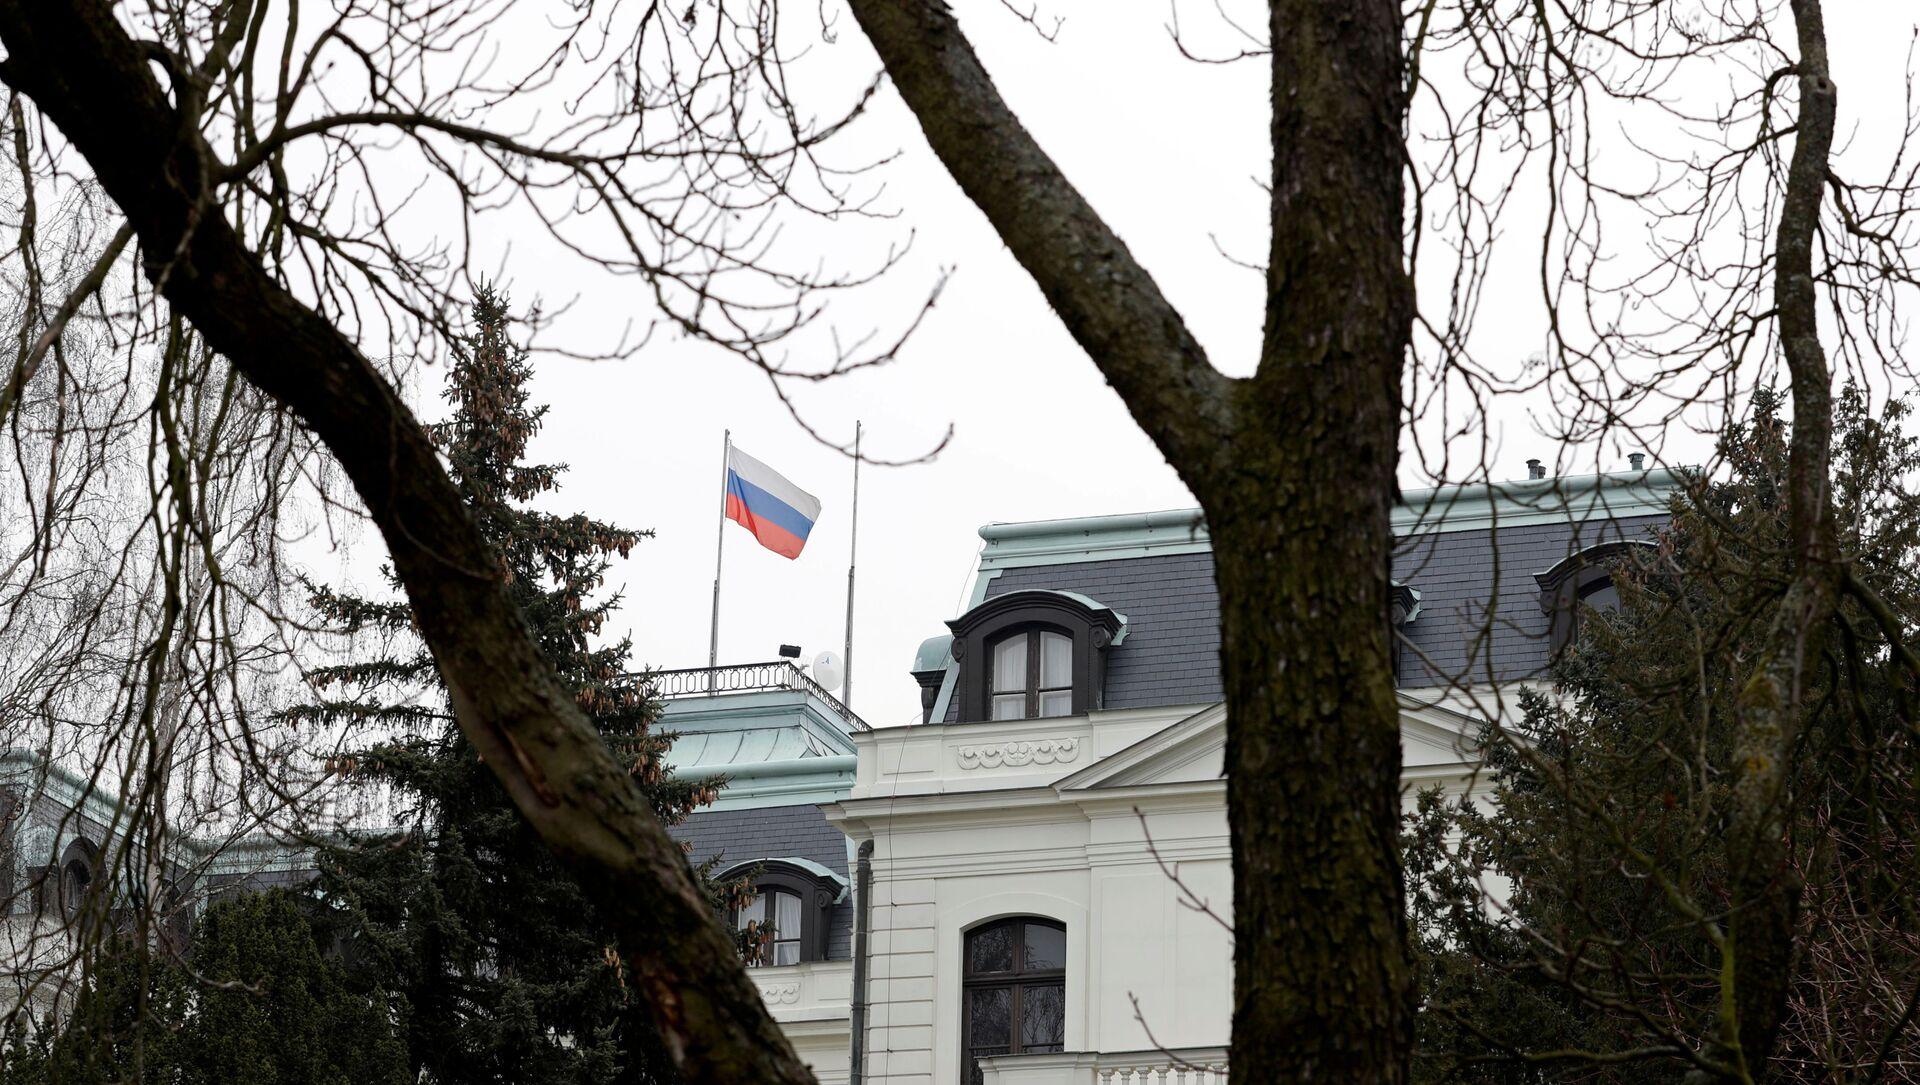 A national flag of Russia flies on the Russian embassy in Prague, Czech Republic, March 26, 2018. - Sputnik Italia, 1920, 21.04.2021